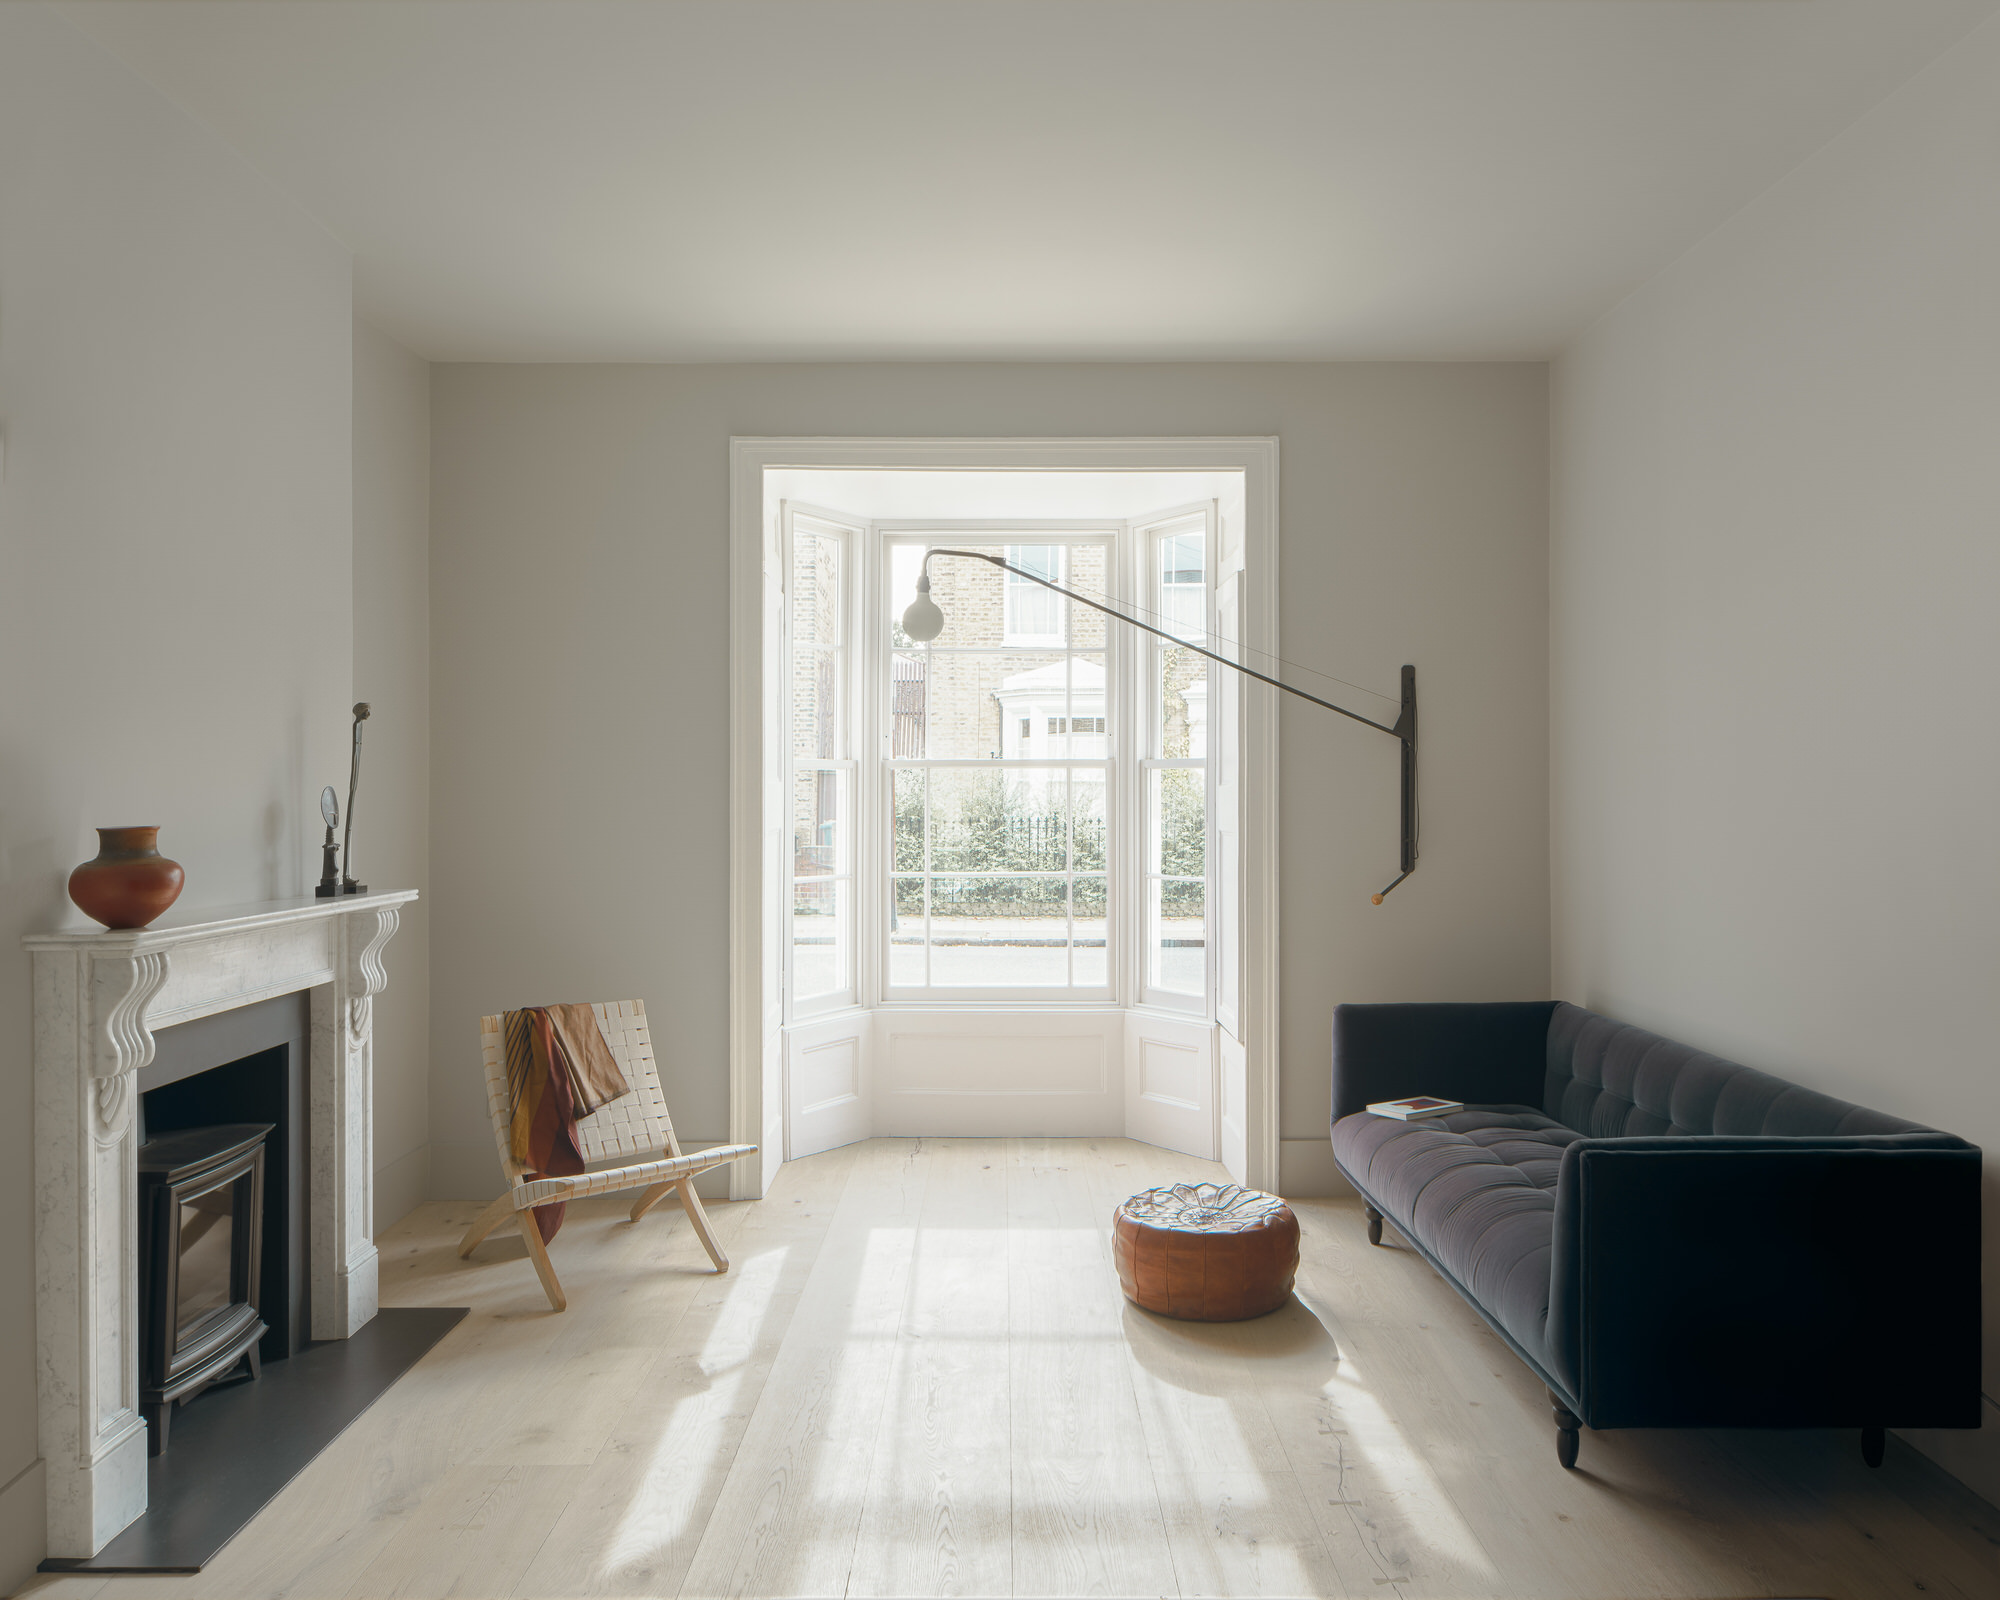 Dgn Studio Concrete Plinth House East London Residential Architecture Photo Nick Dearden Yellowtrace 15